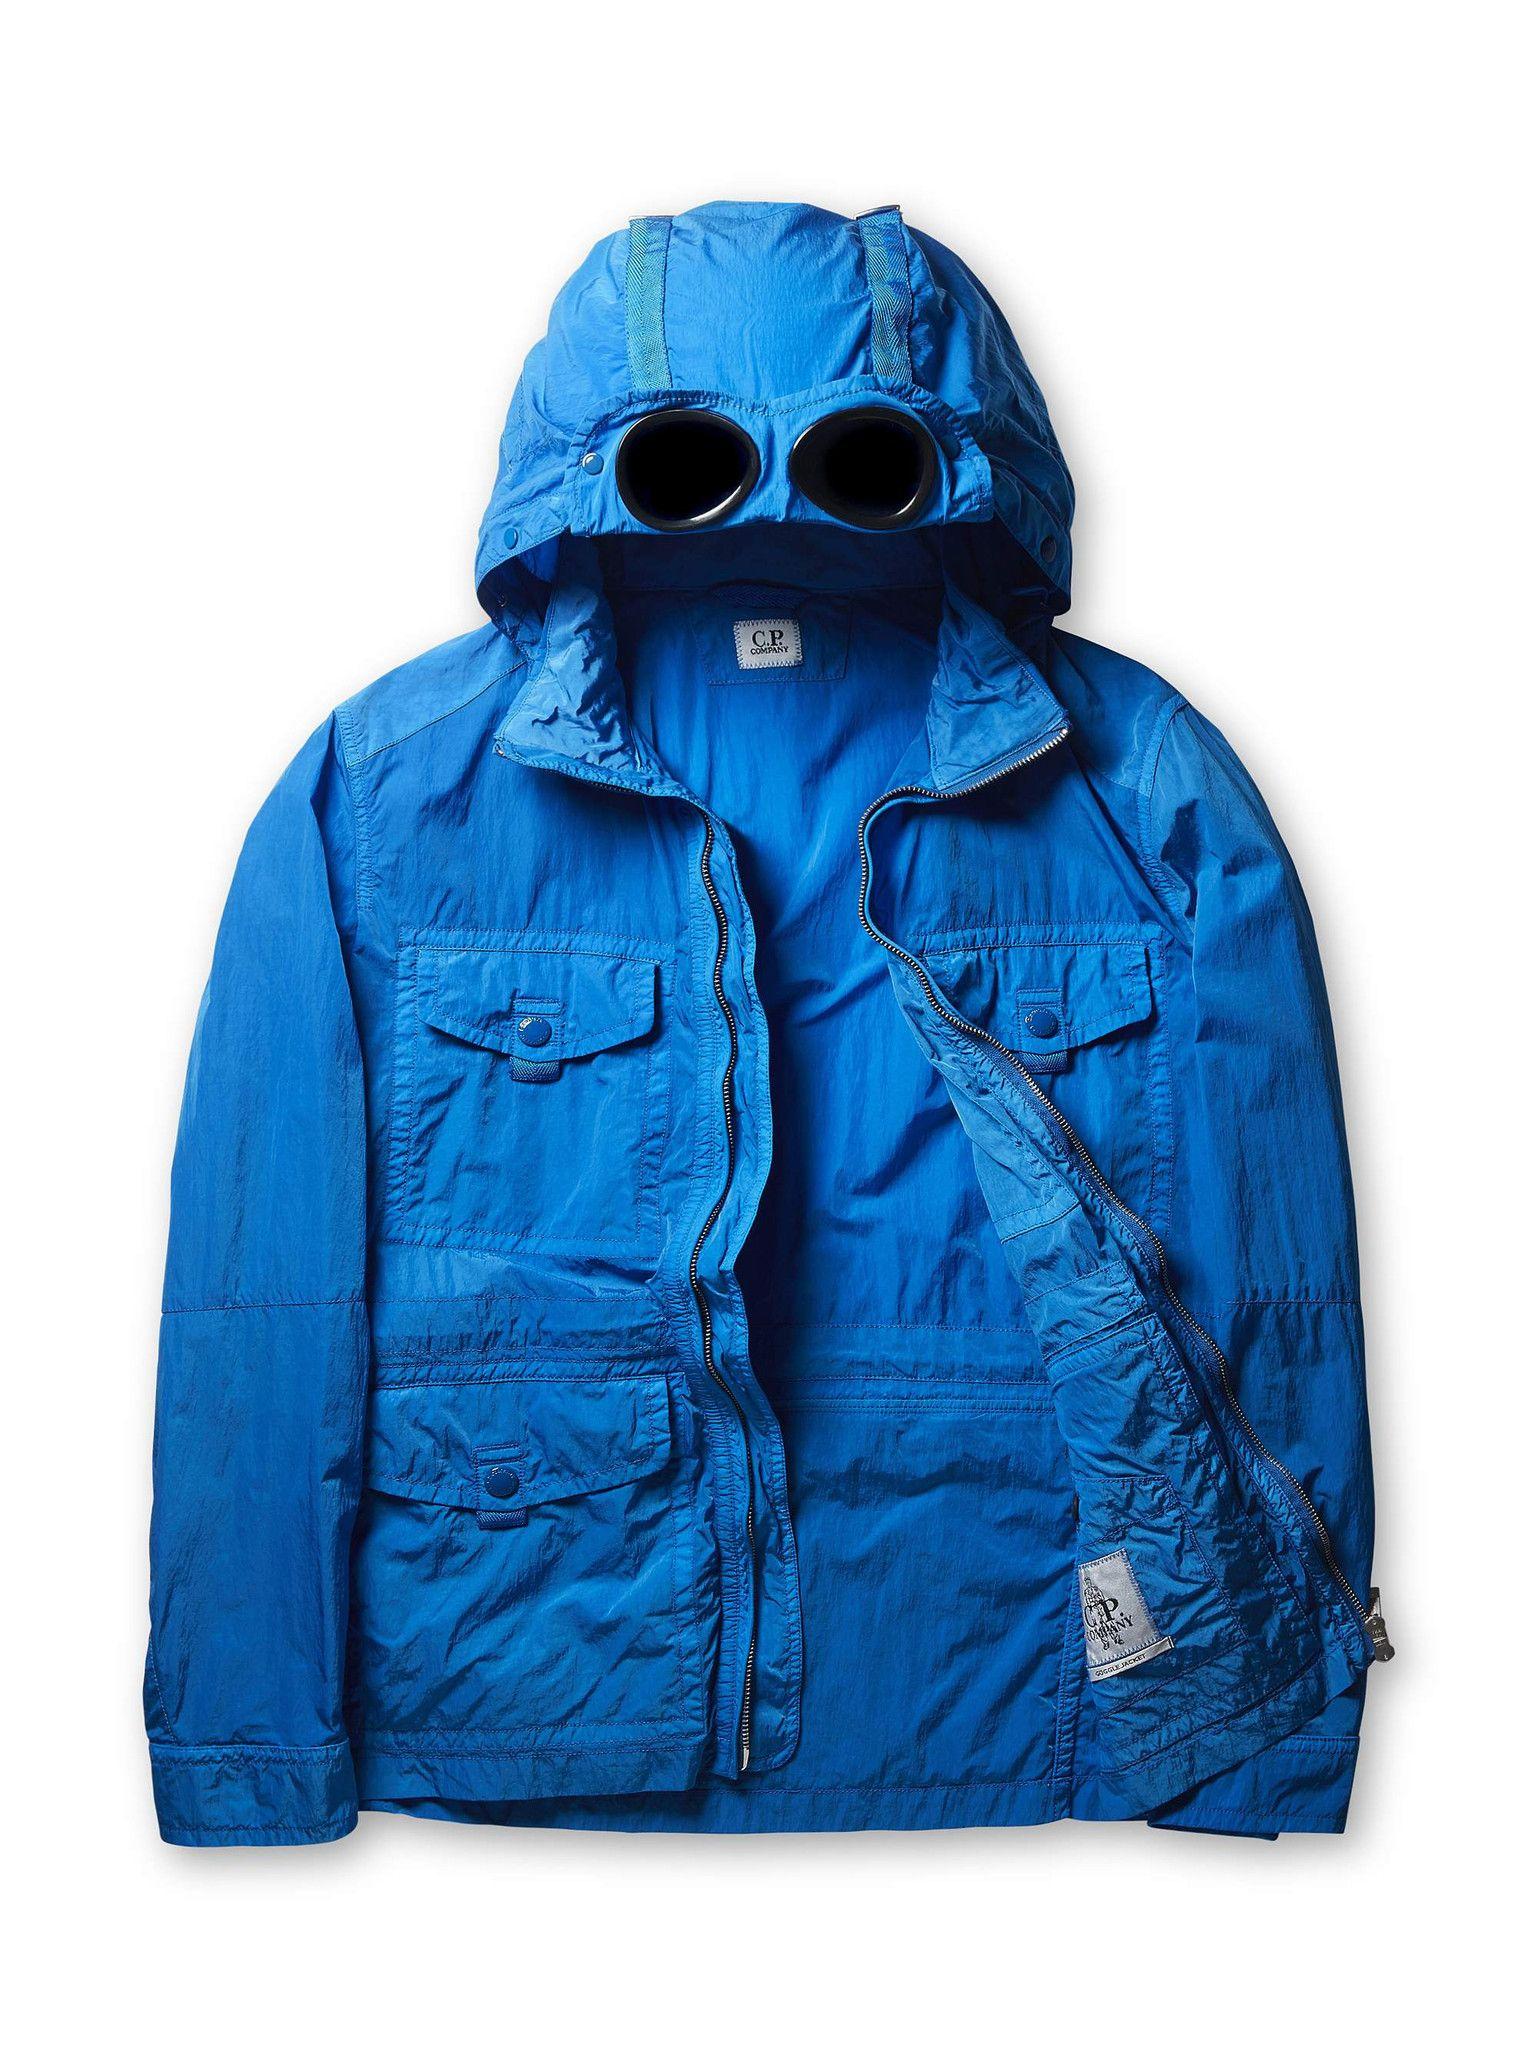 b1683edf C.P. Company Chrome Goggle Parachute Hood Panelled Field Jacket in Blue